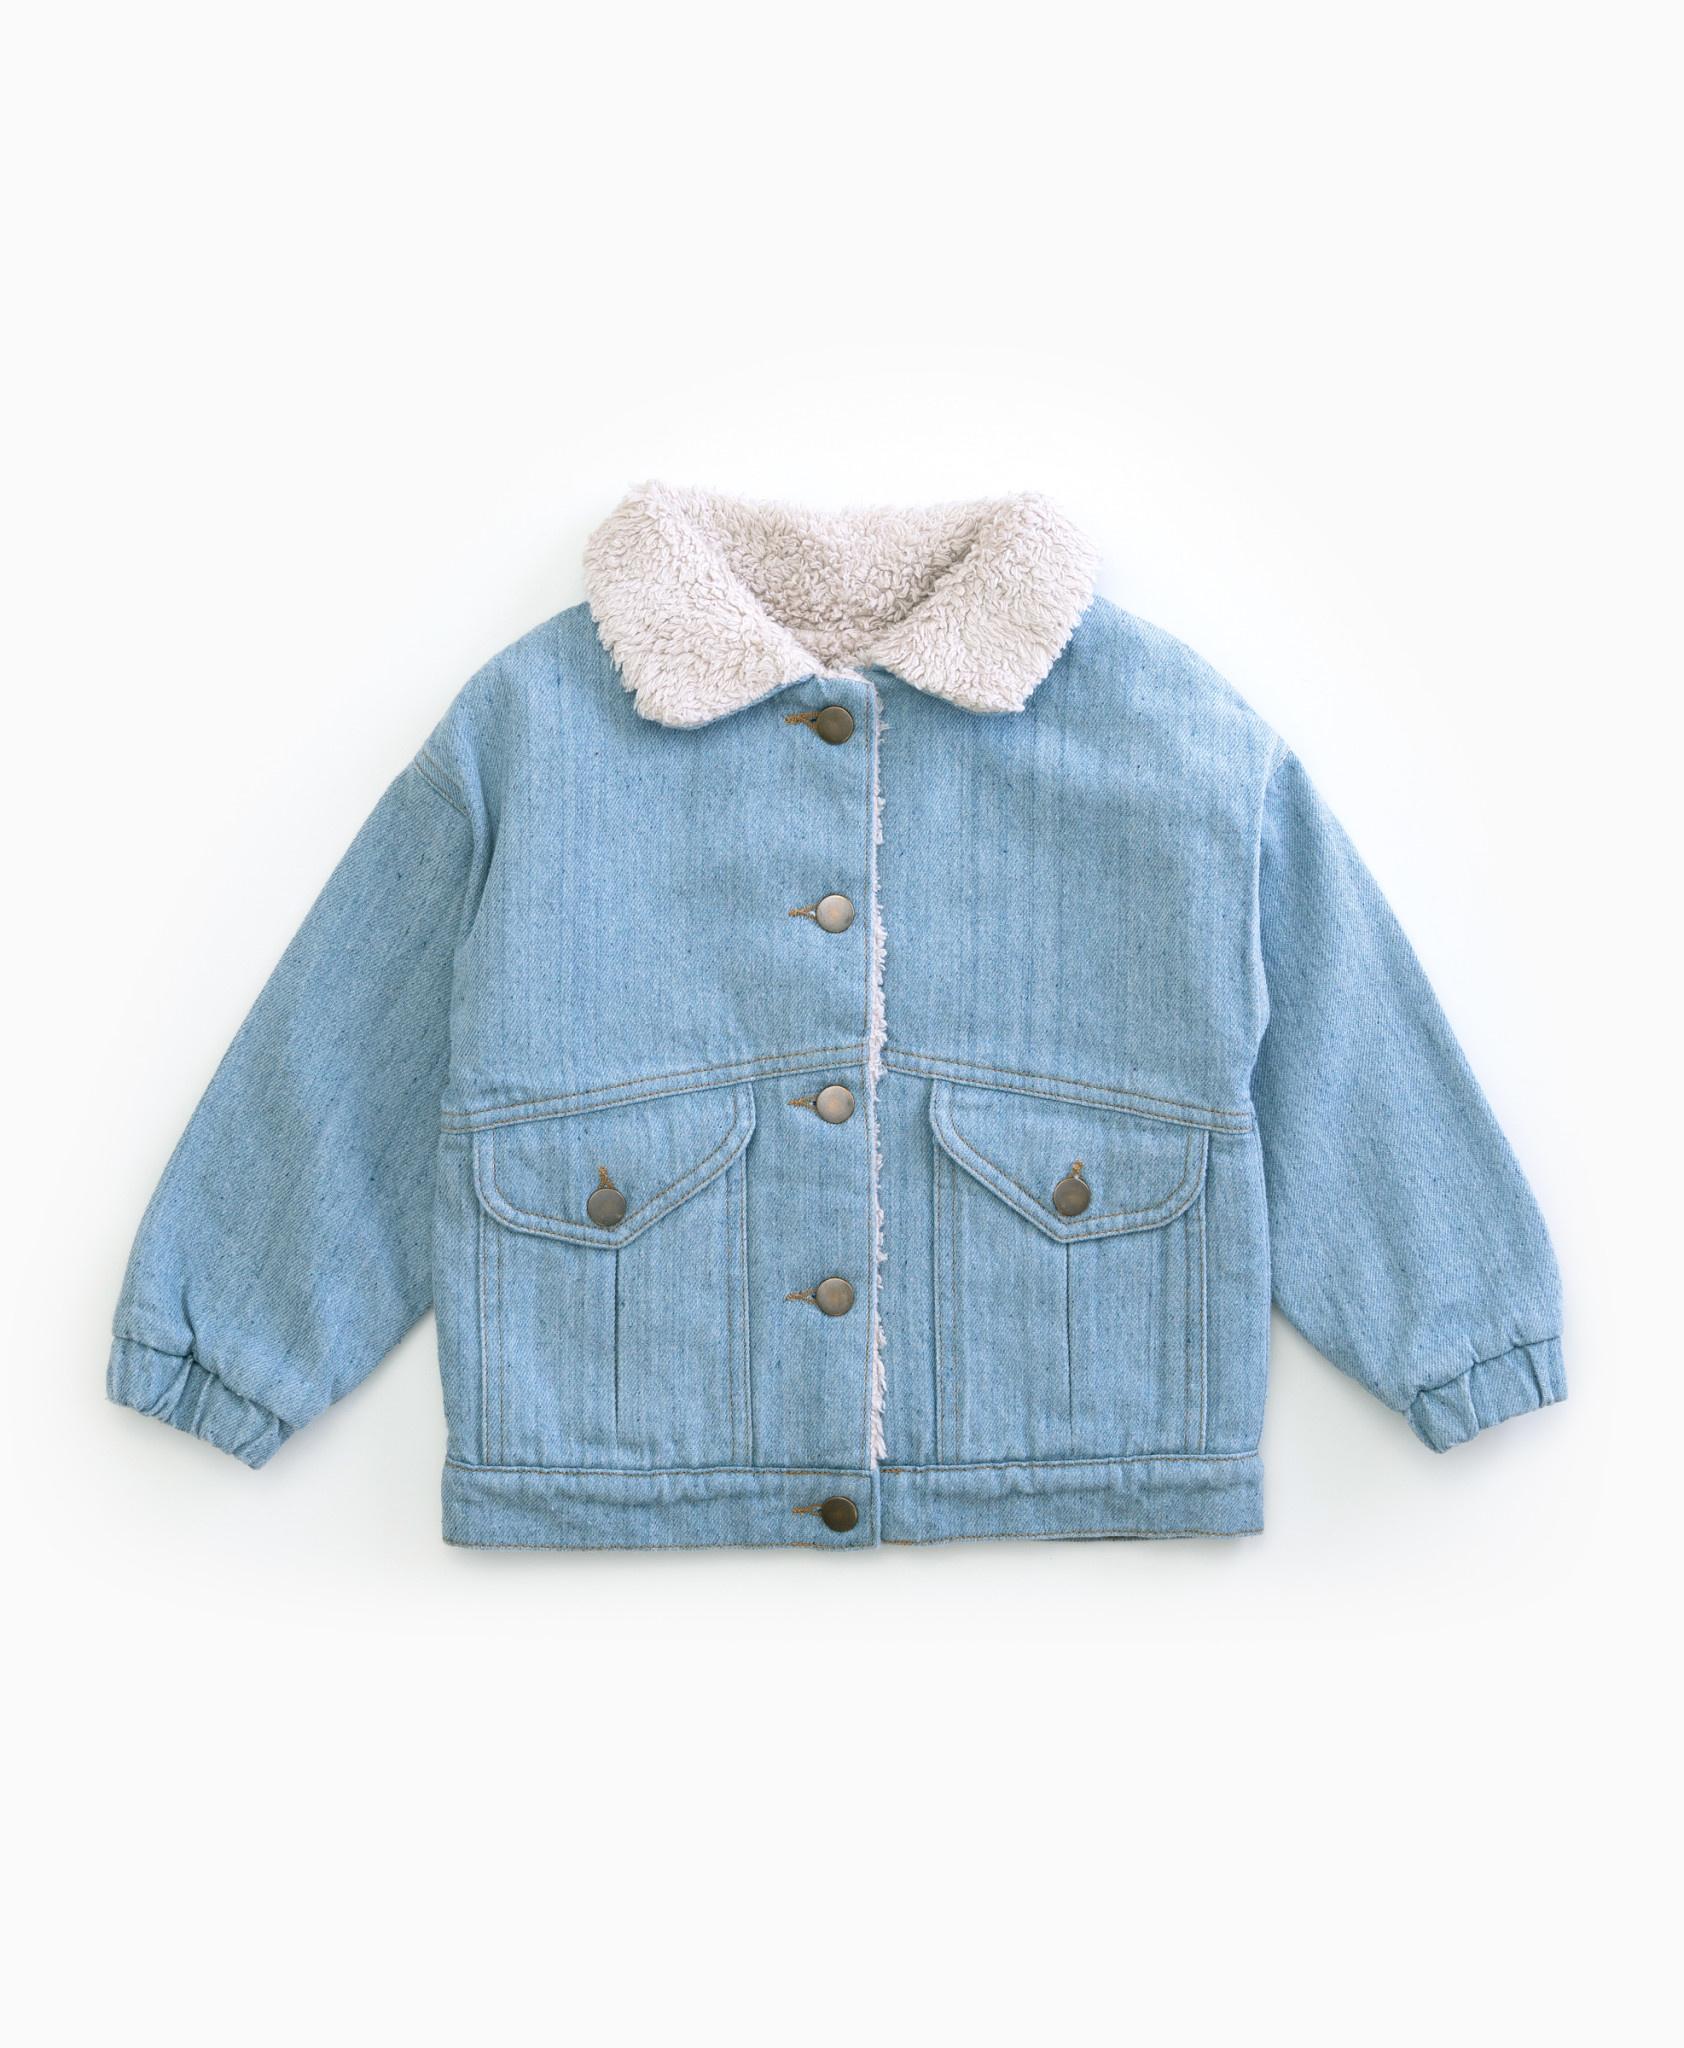 Recycled denim jacket-1